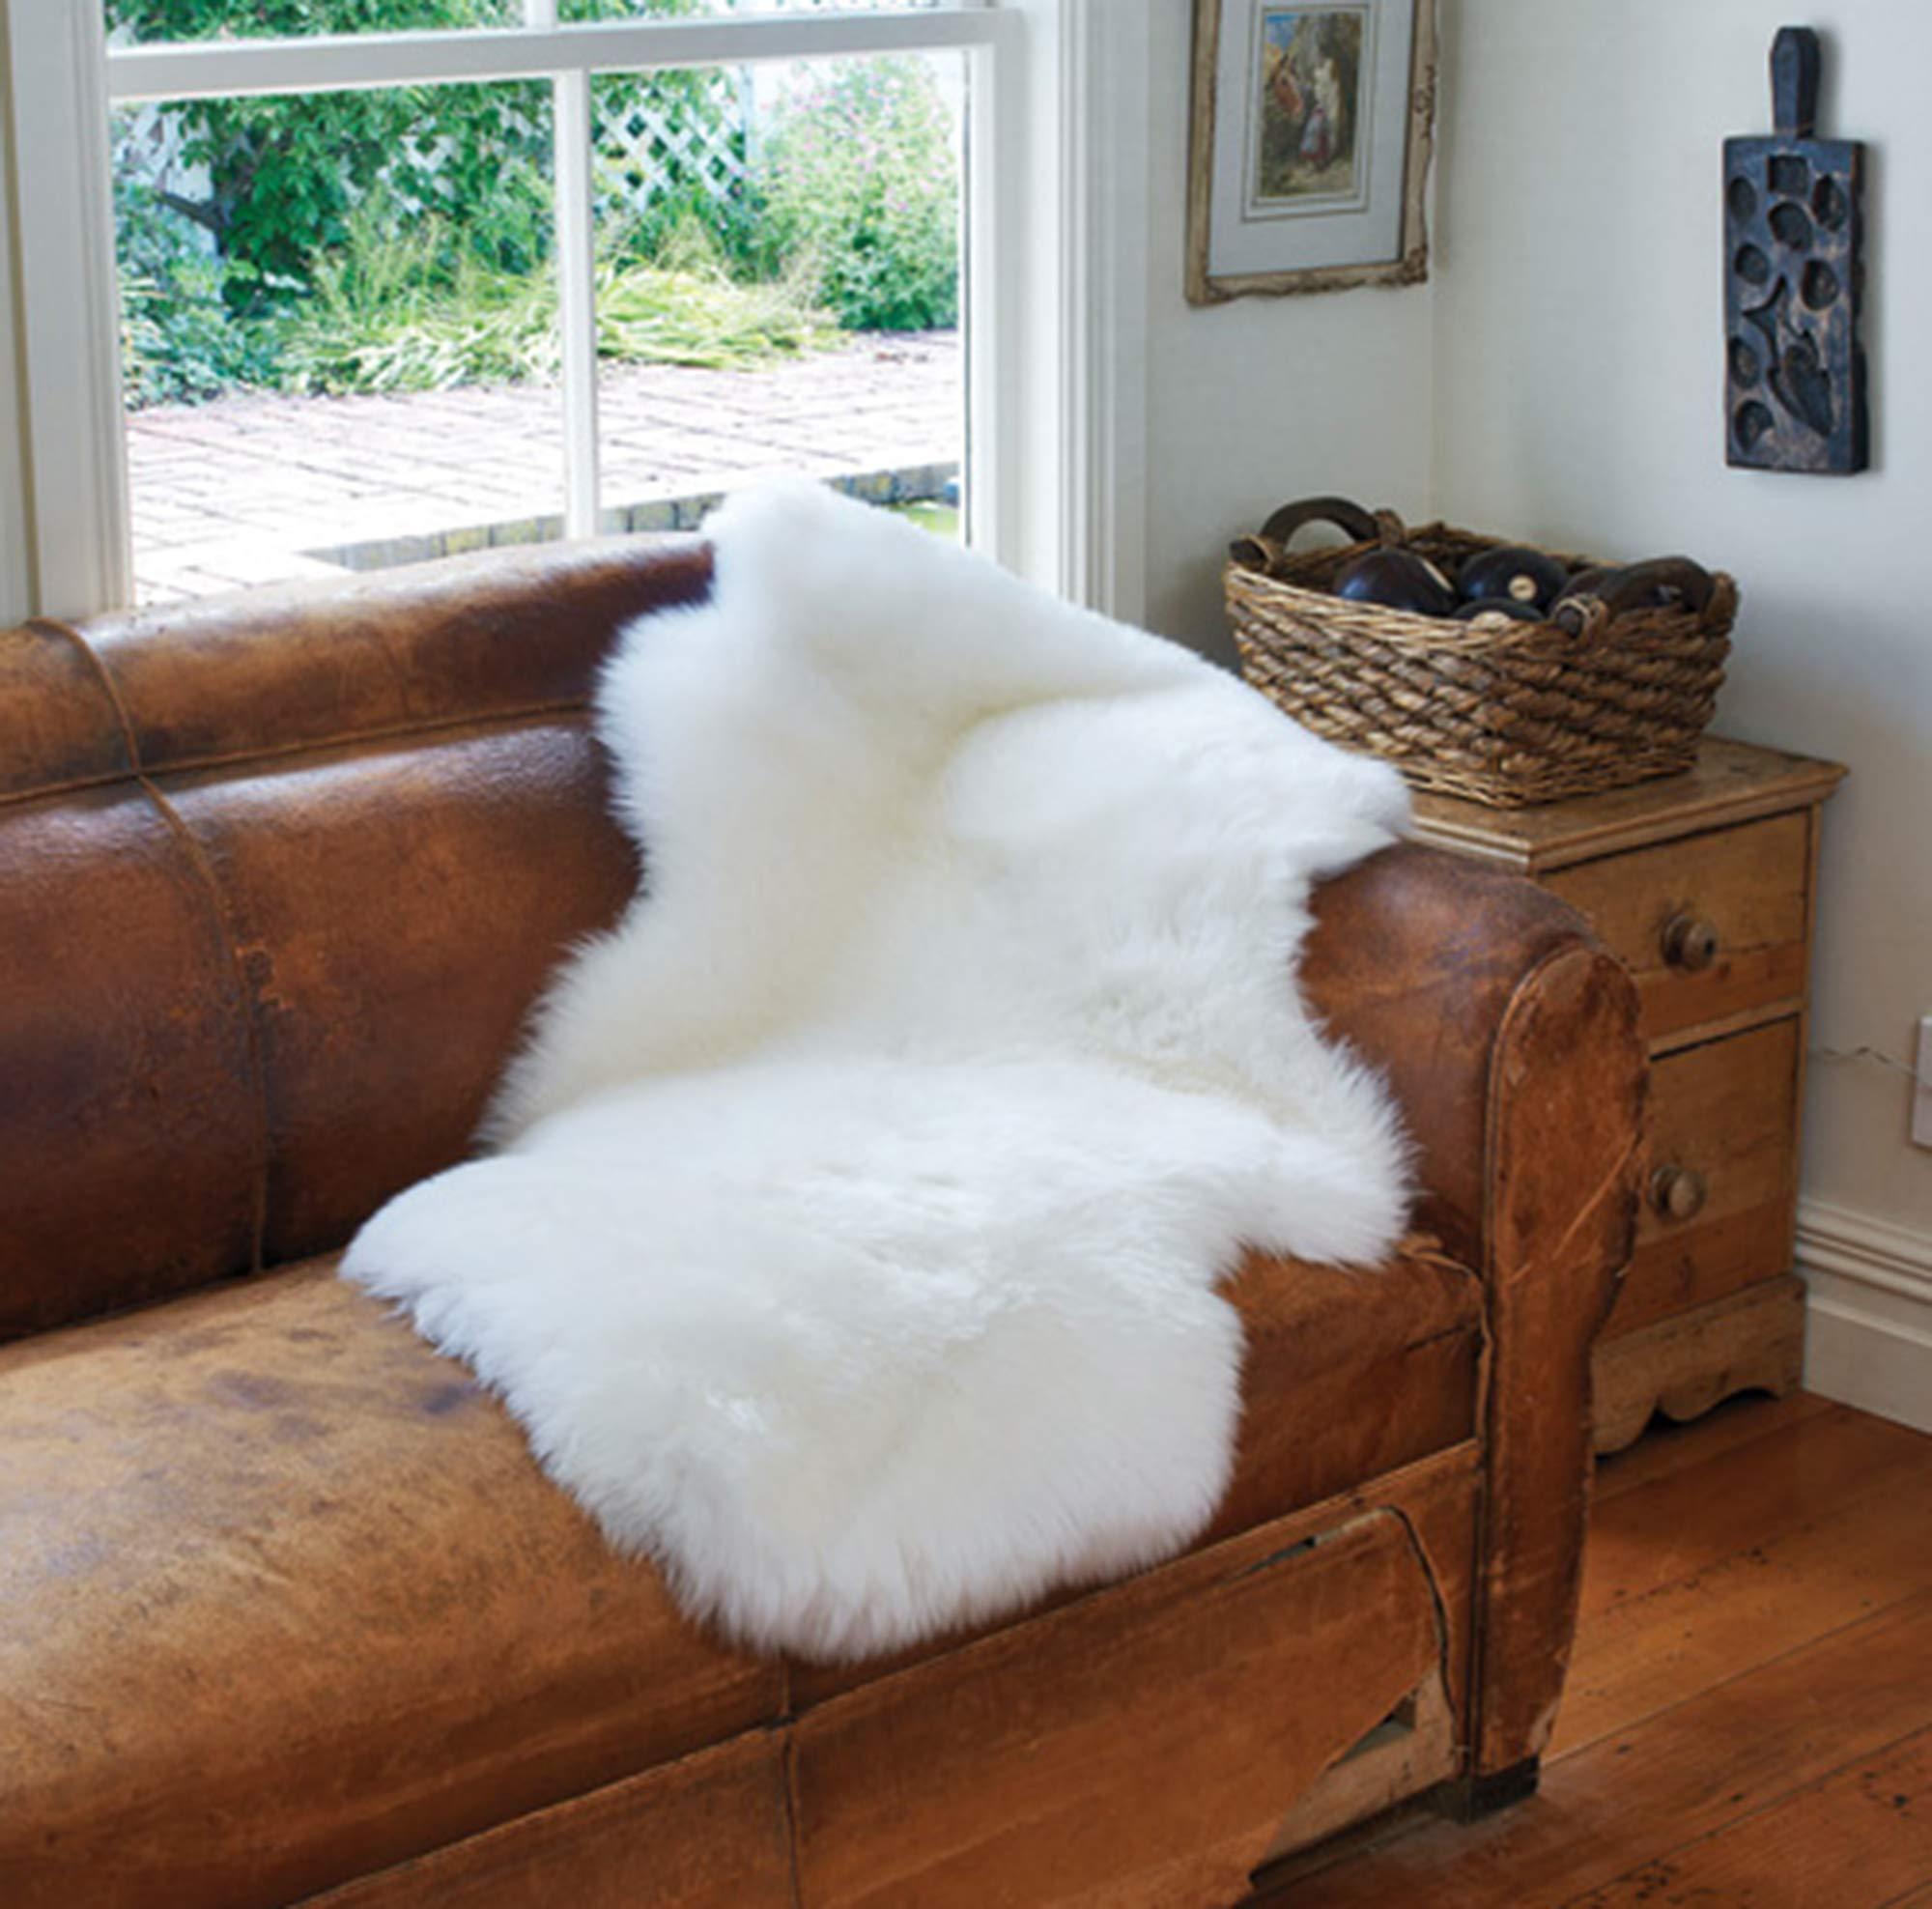 A-STAR White Real Sheepskin Rug 2x3 - Single Pelt  Sheep Skin Fur Rug by A-STAR (TM)